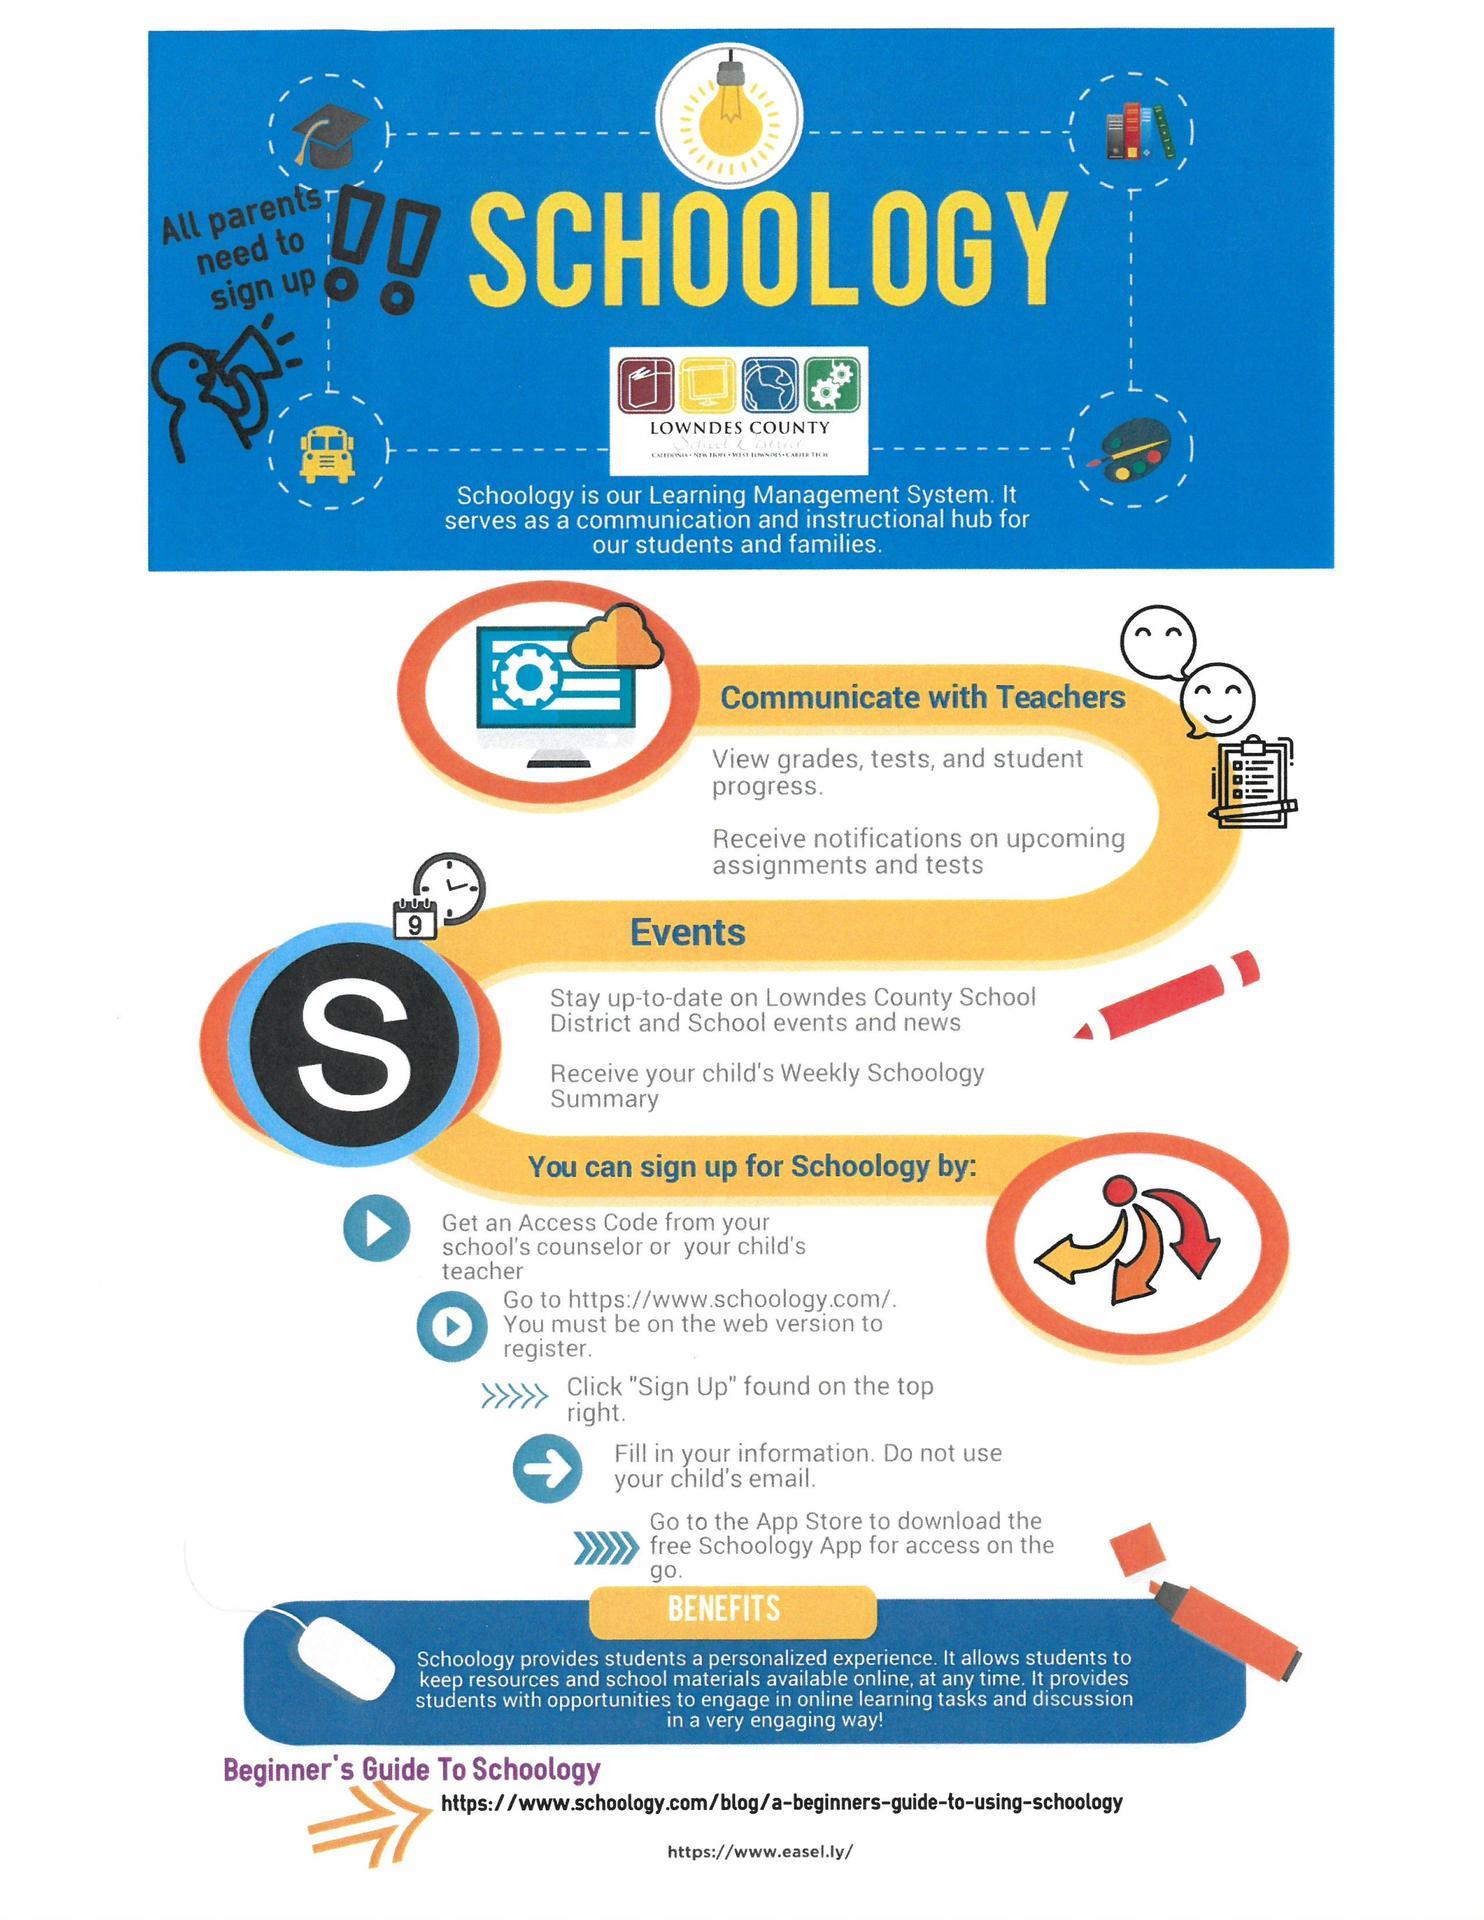 1.Schoology infographic